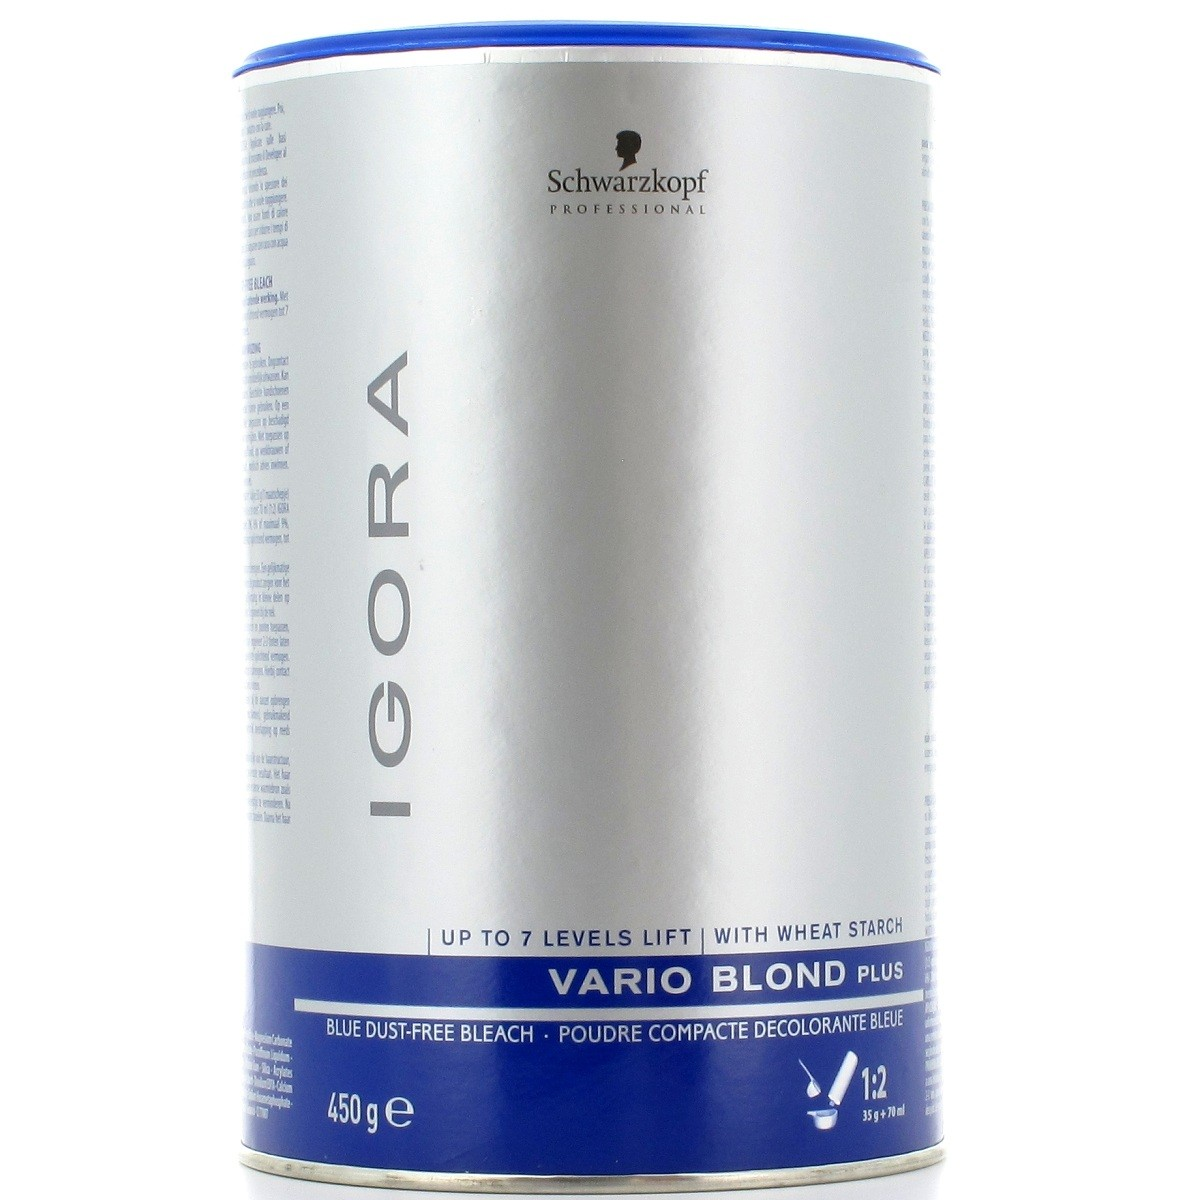 Pó Descolorante Igora Vario Blond Plus Schwarzkopf 450g